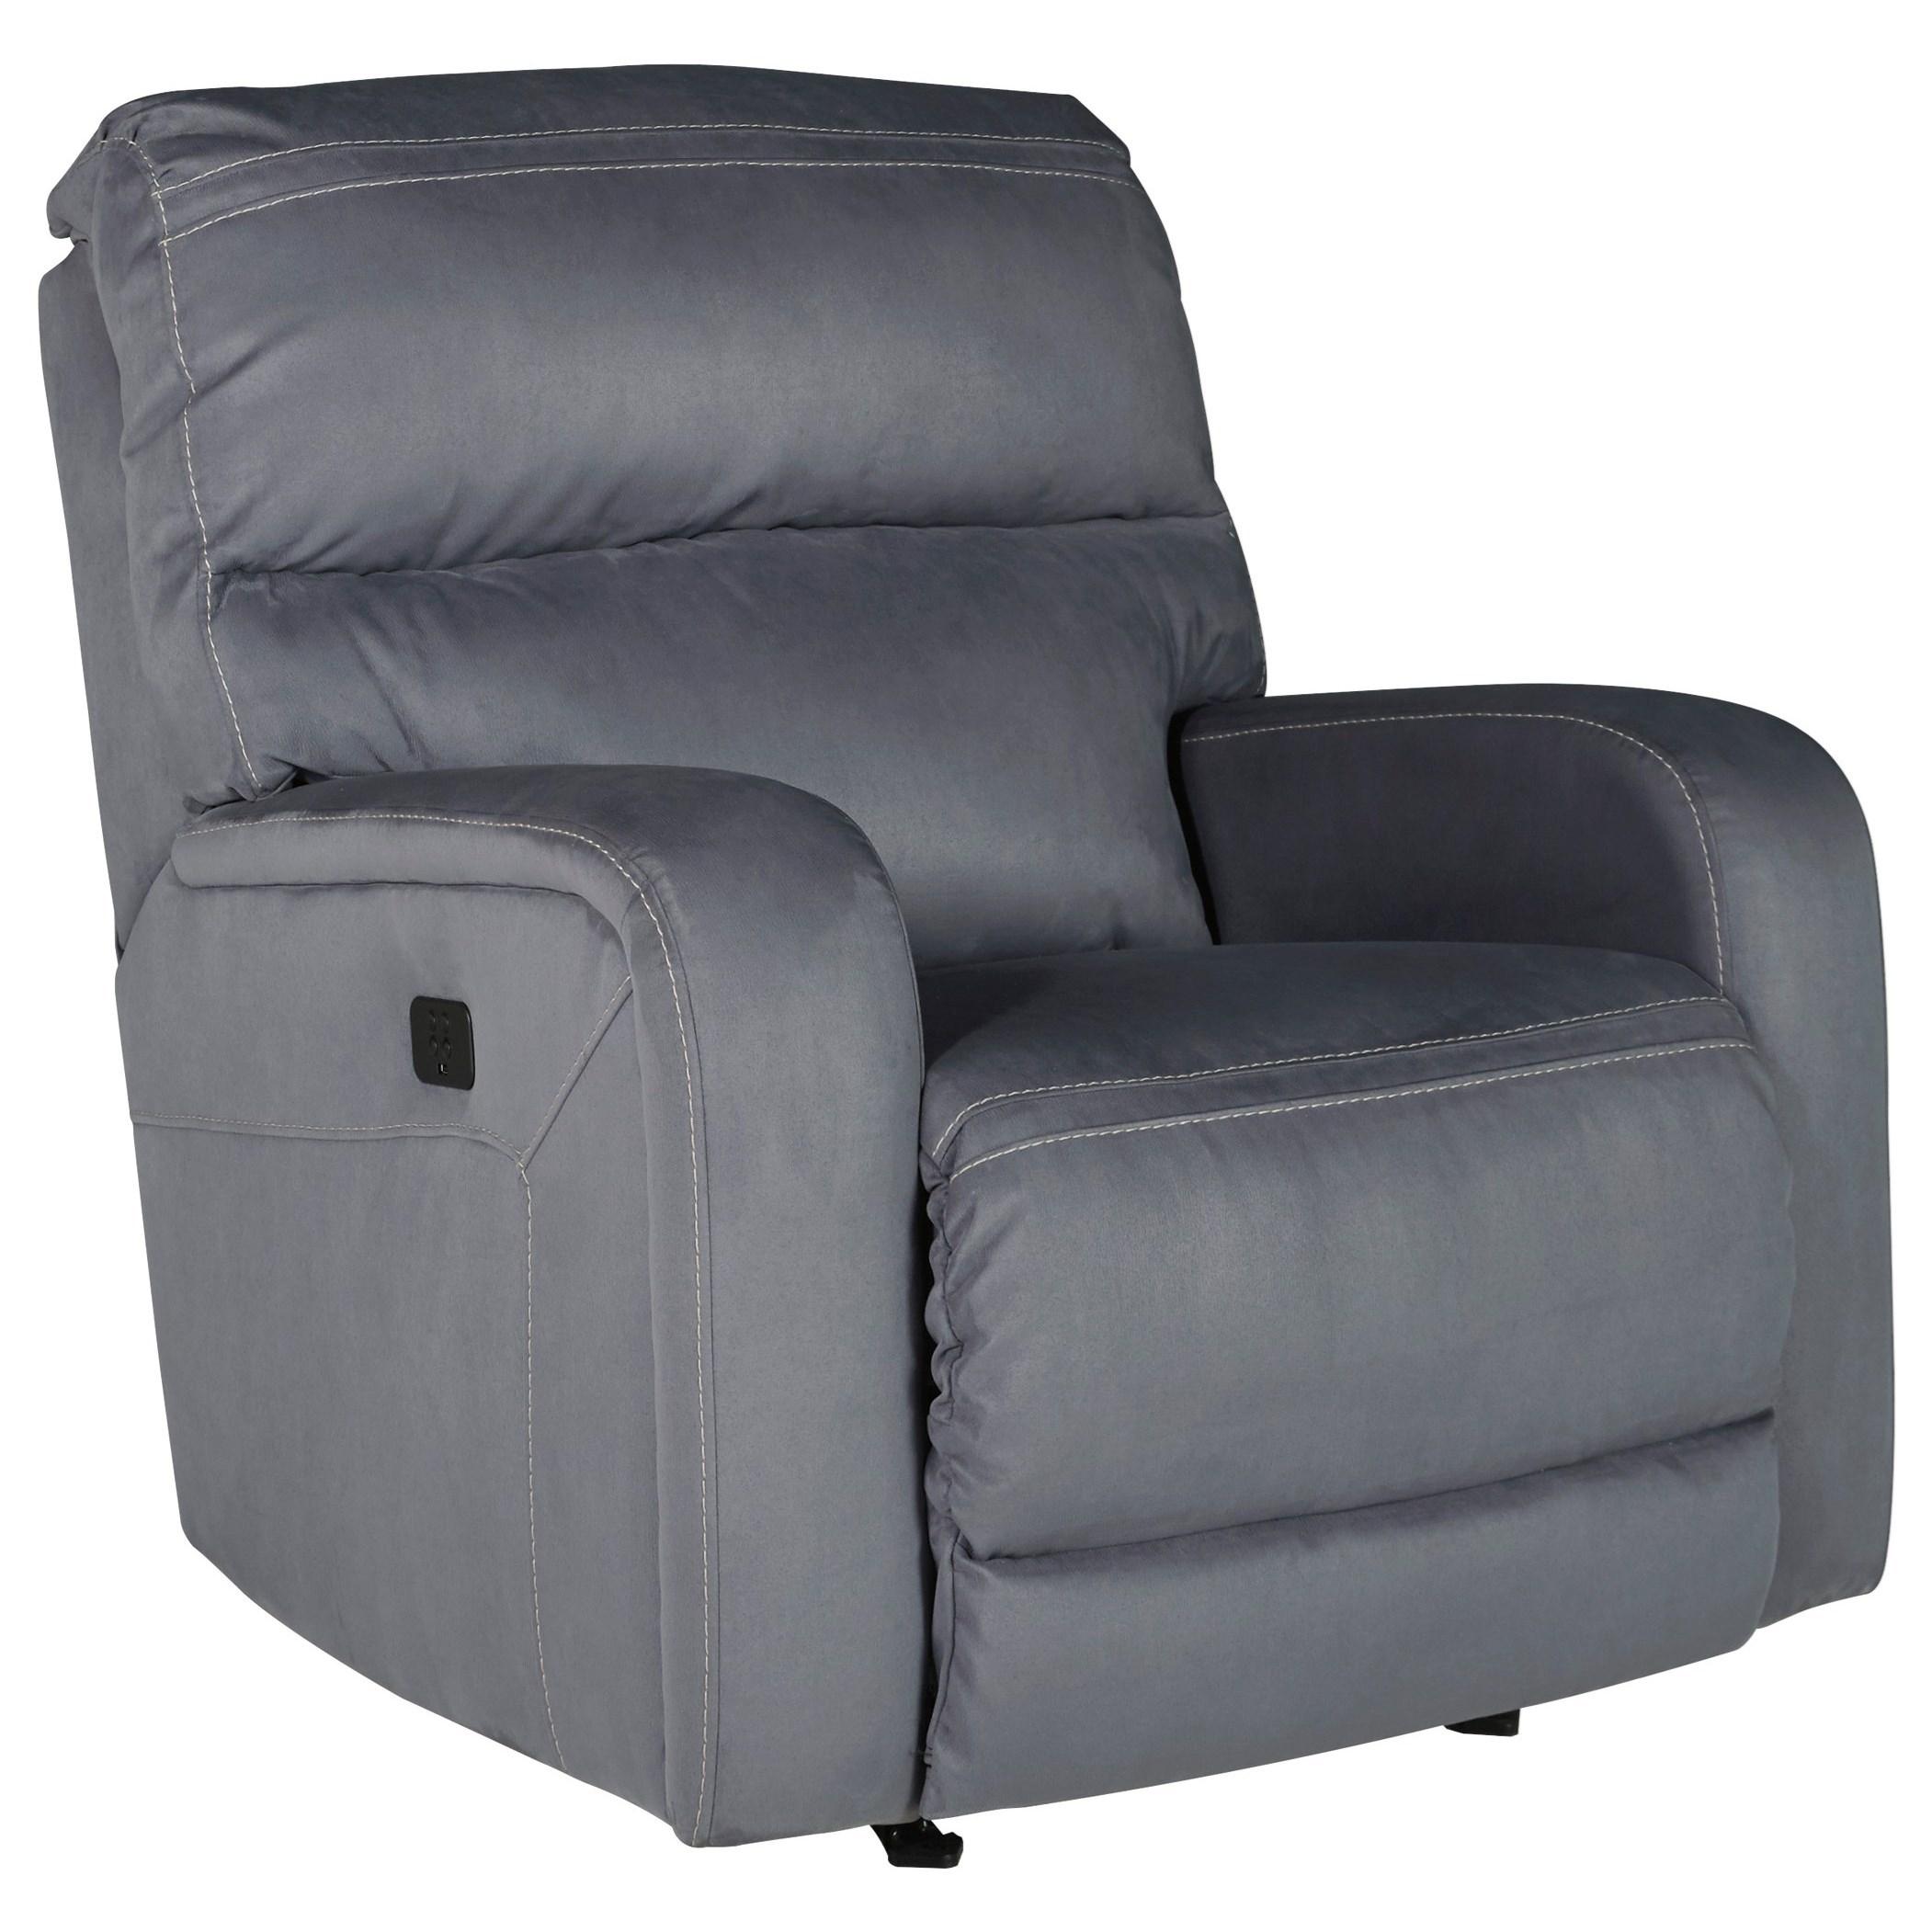 Trendz Alani Power Rocker Recliner w/ Adjustable Headrest - Item Number: 7530513